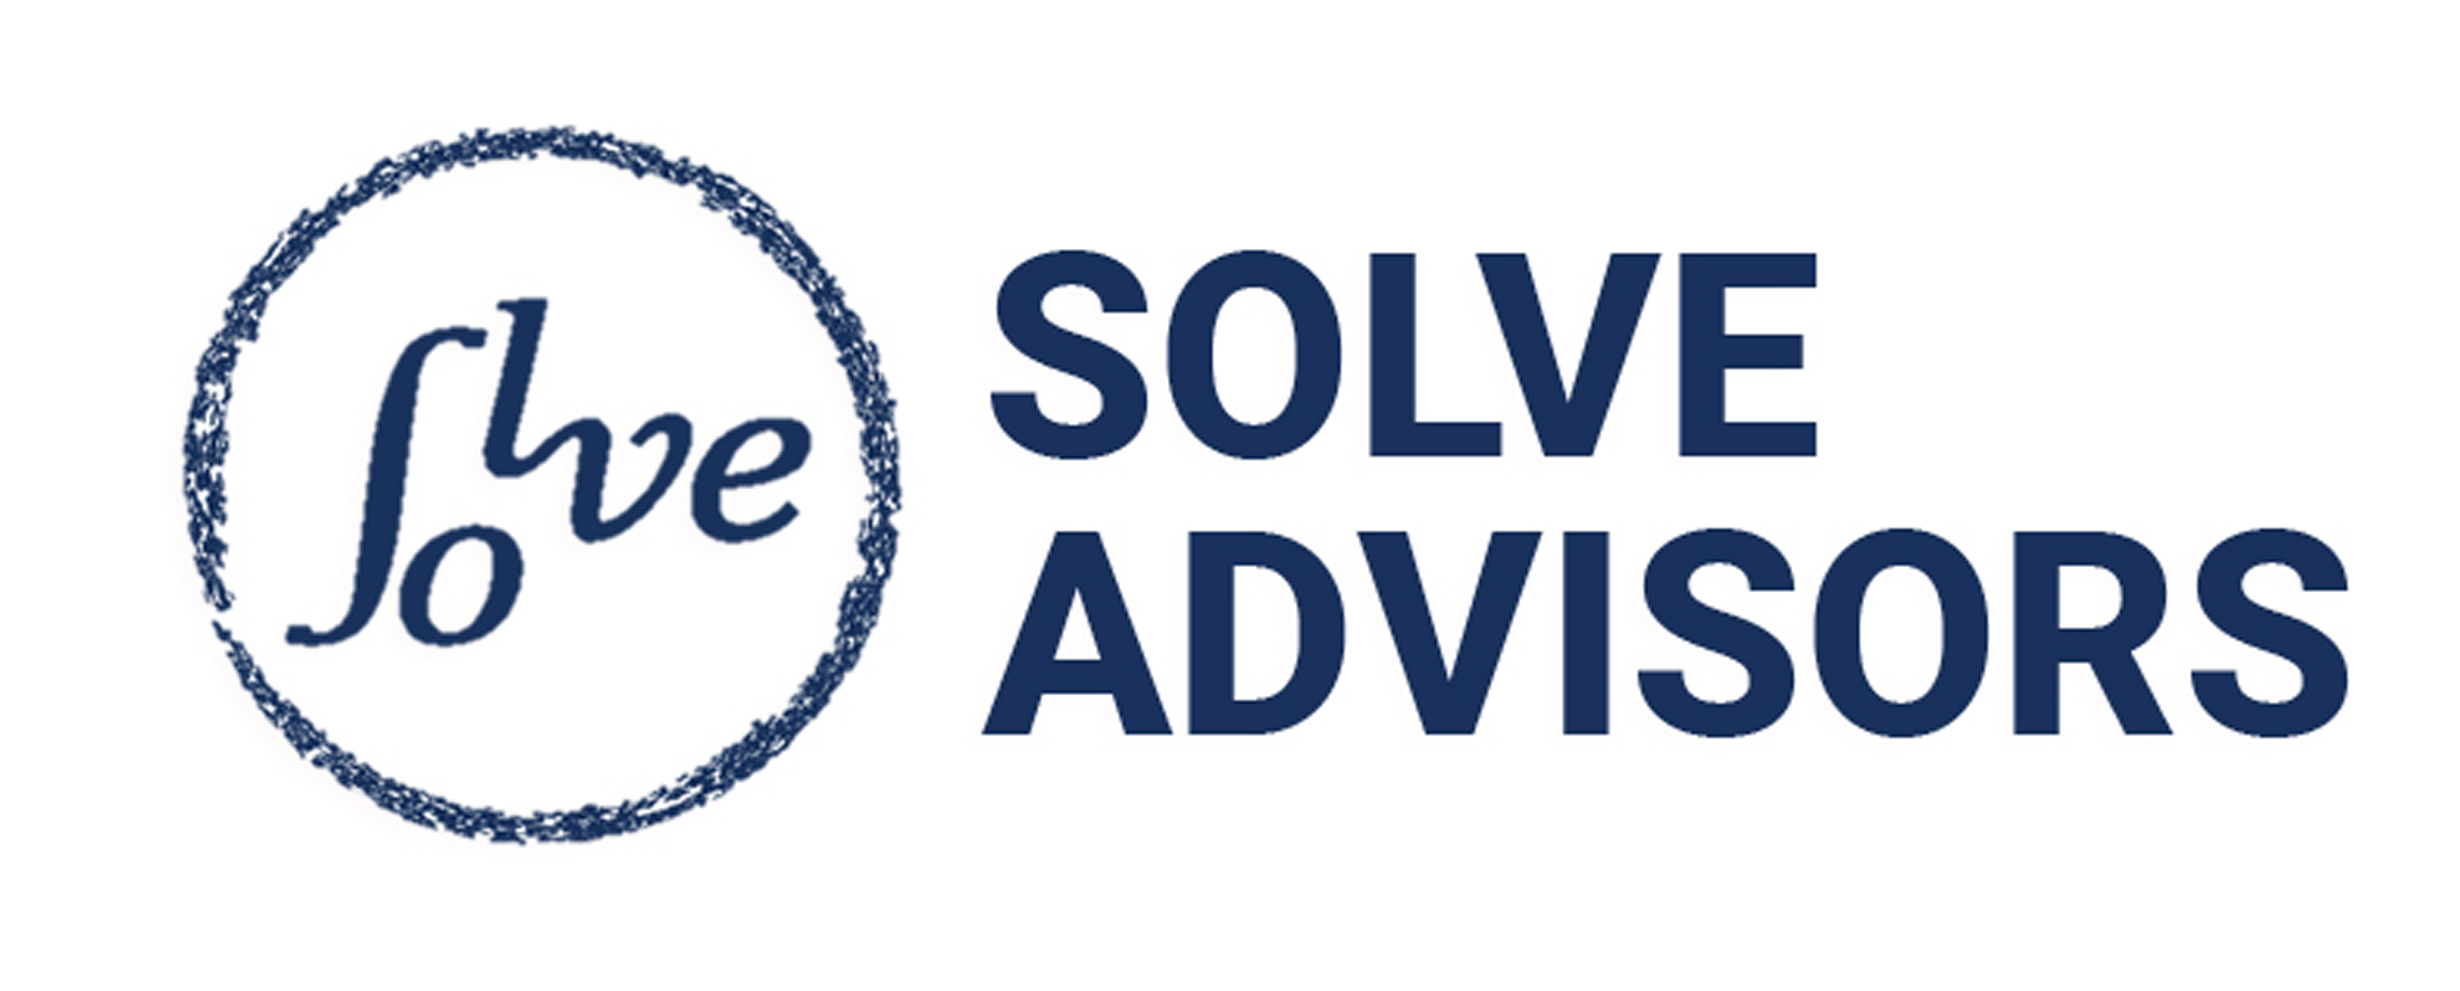 SolveAdvisors2017_HighRes